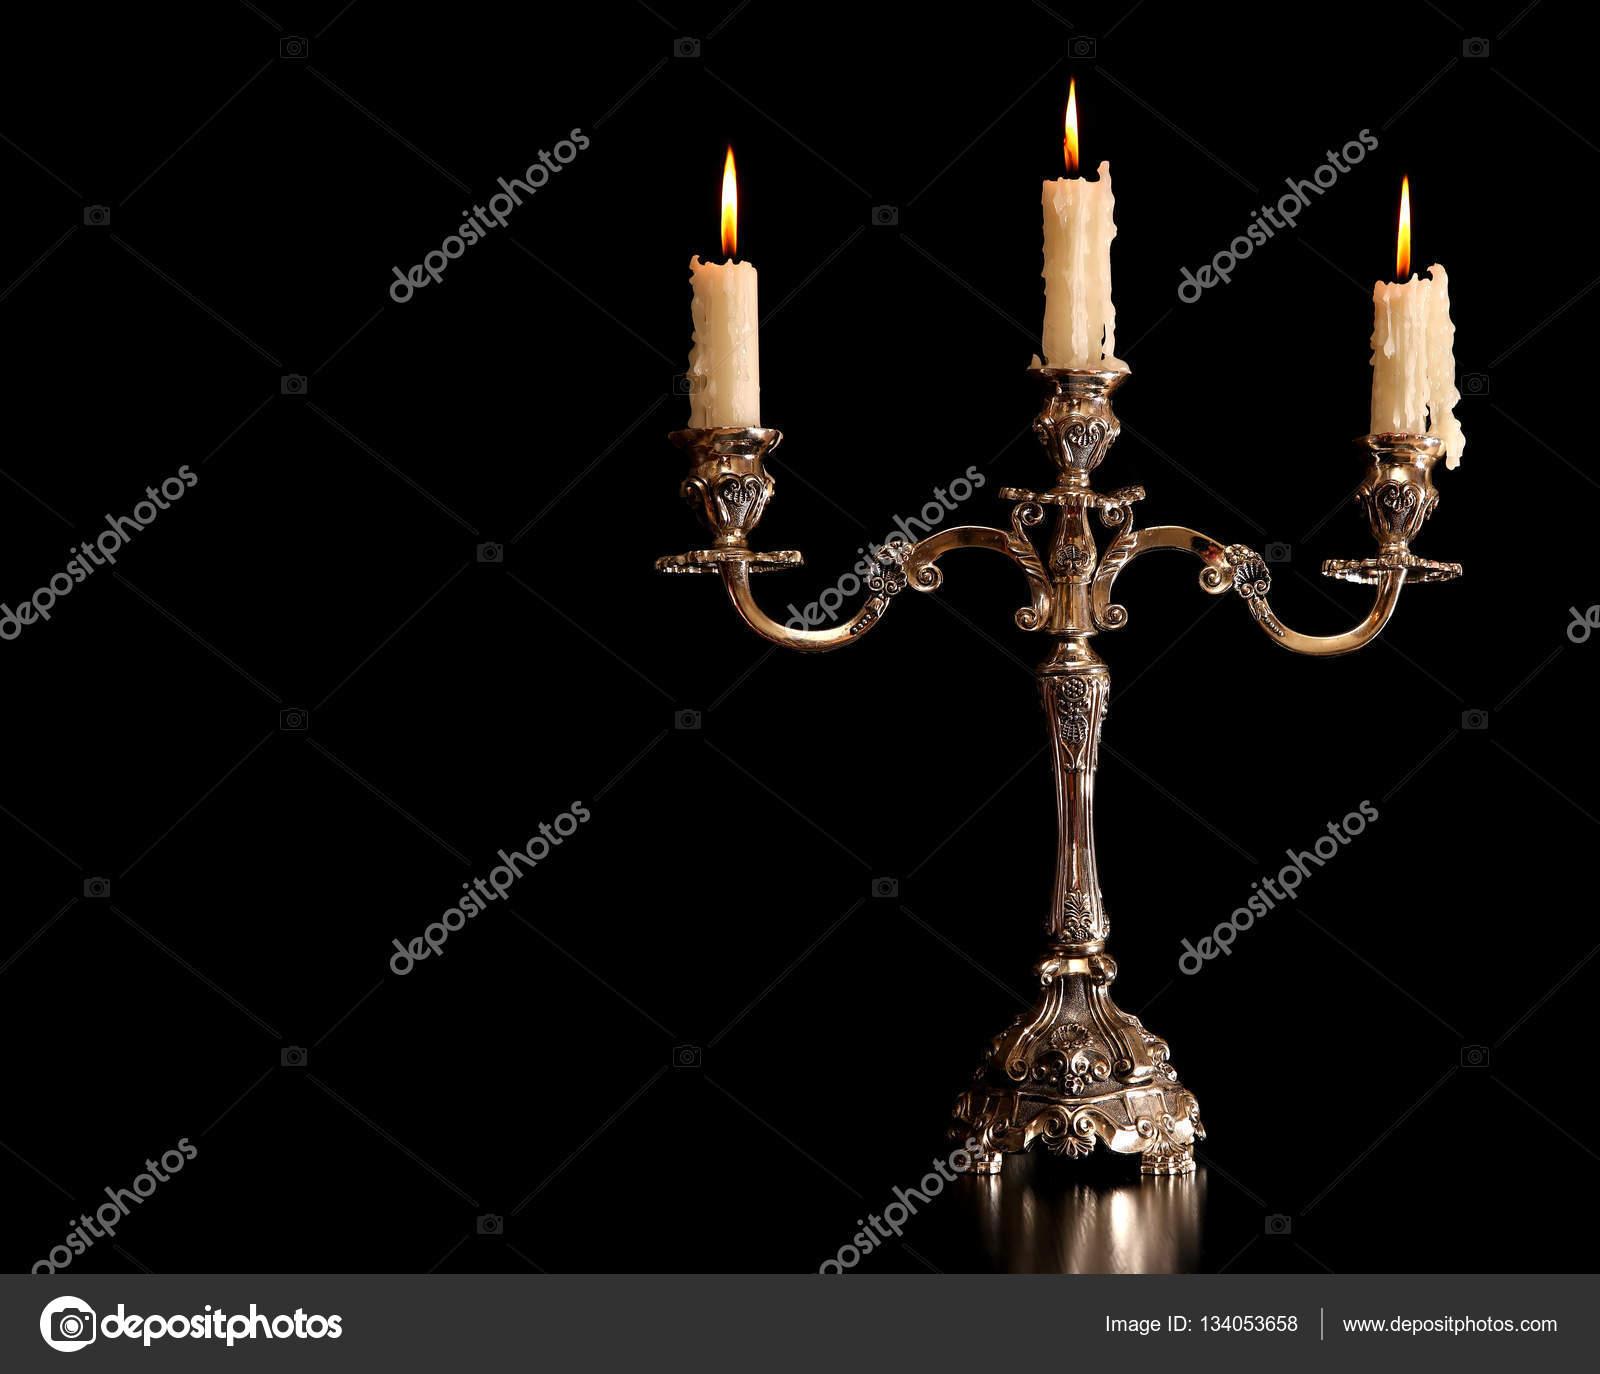 Burning Old Candle Vintage Bronze Candlestick Isolated On Black Background Photo By Natalyaa